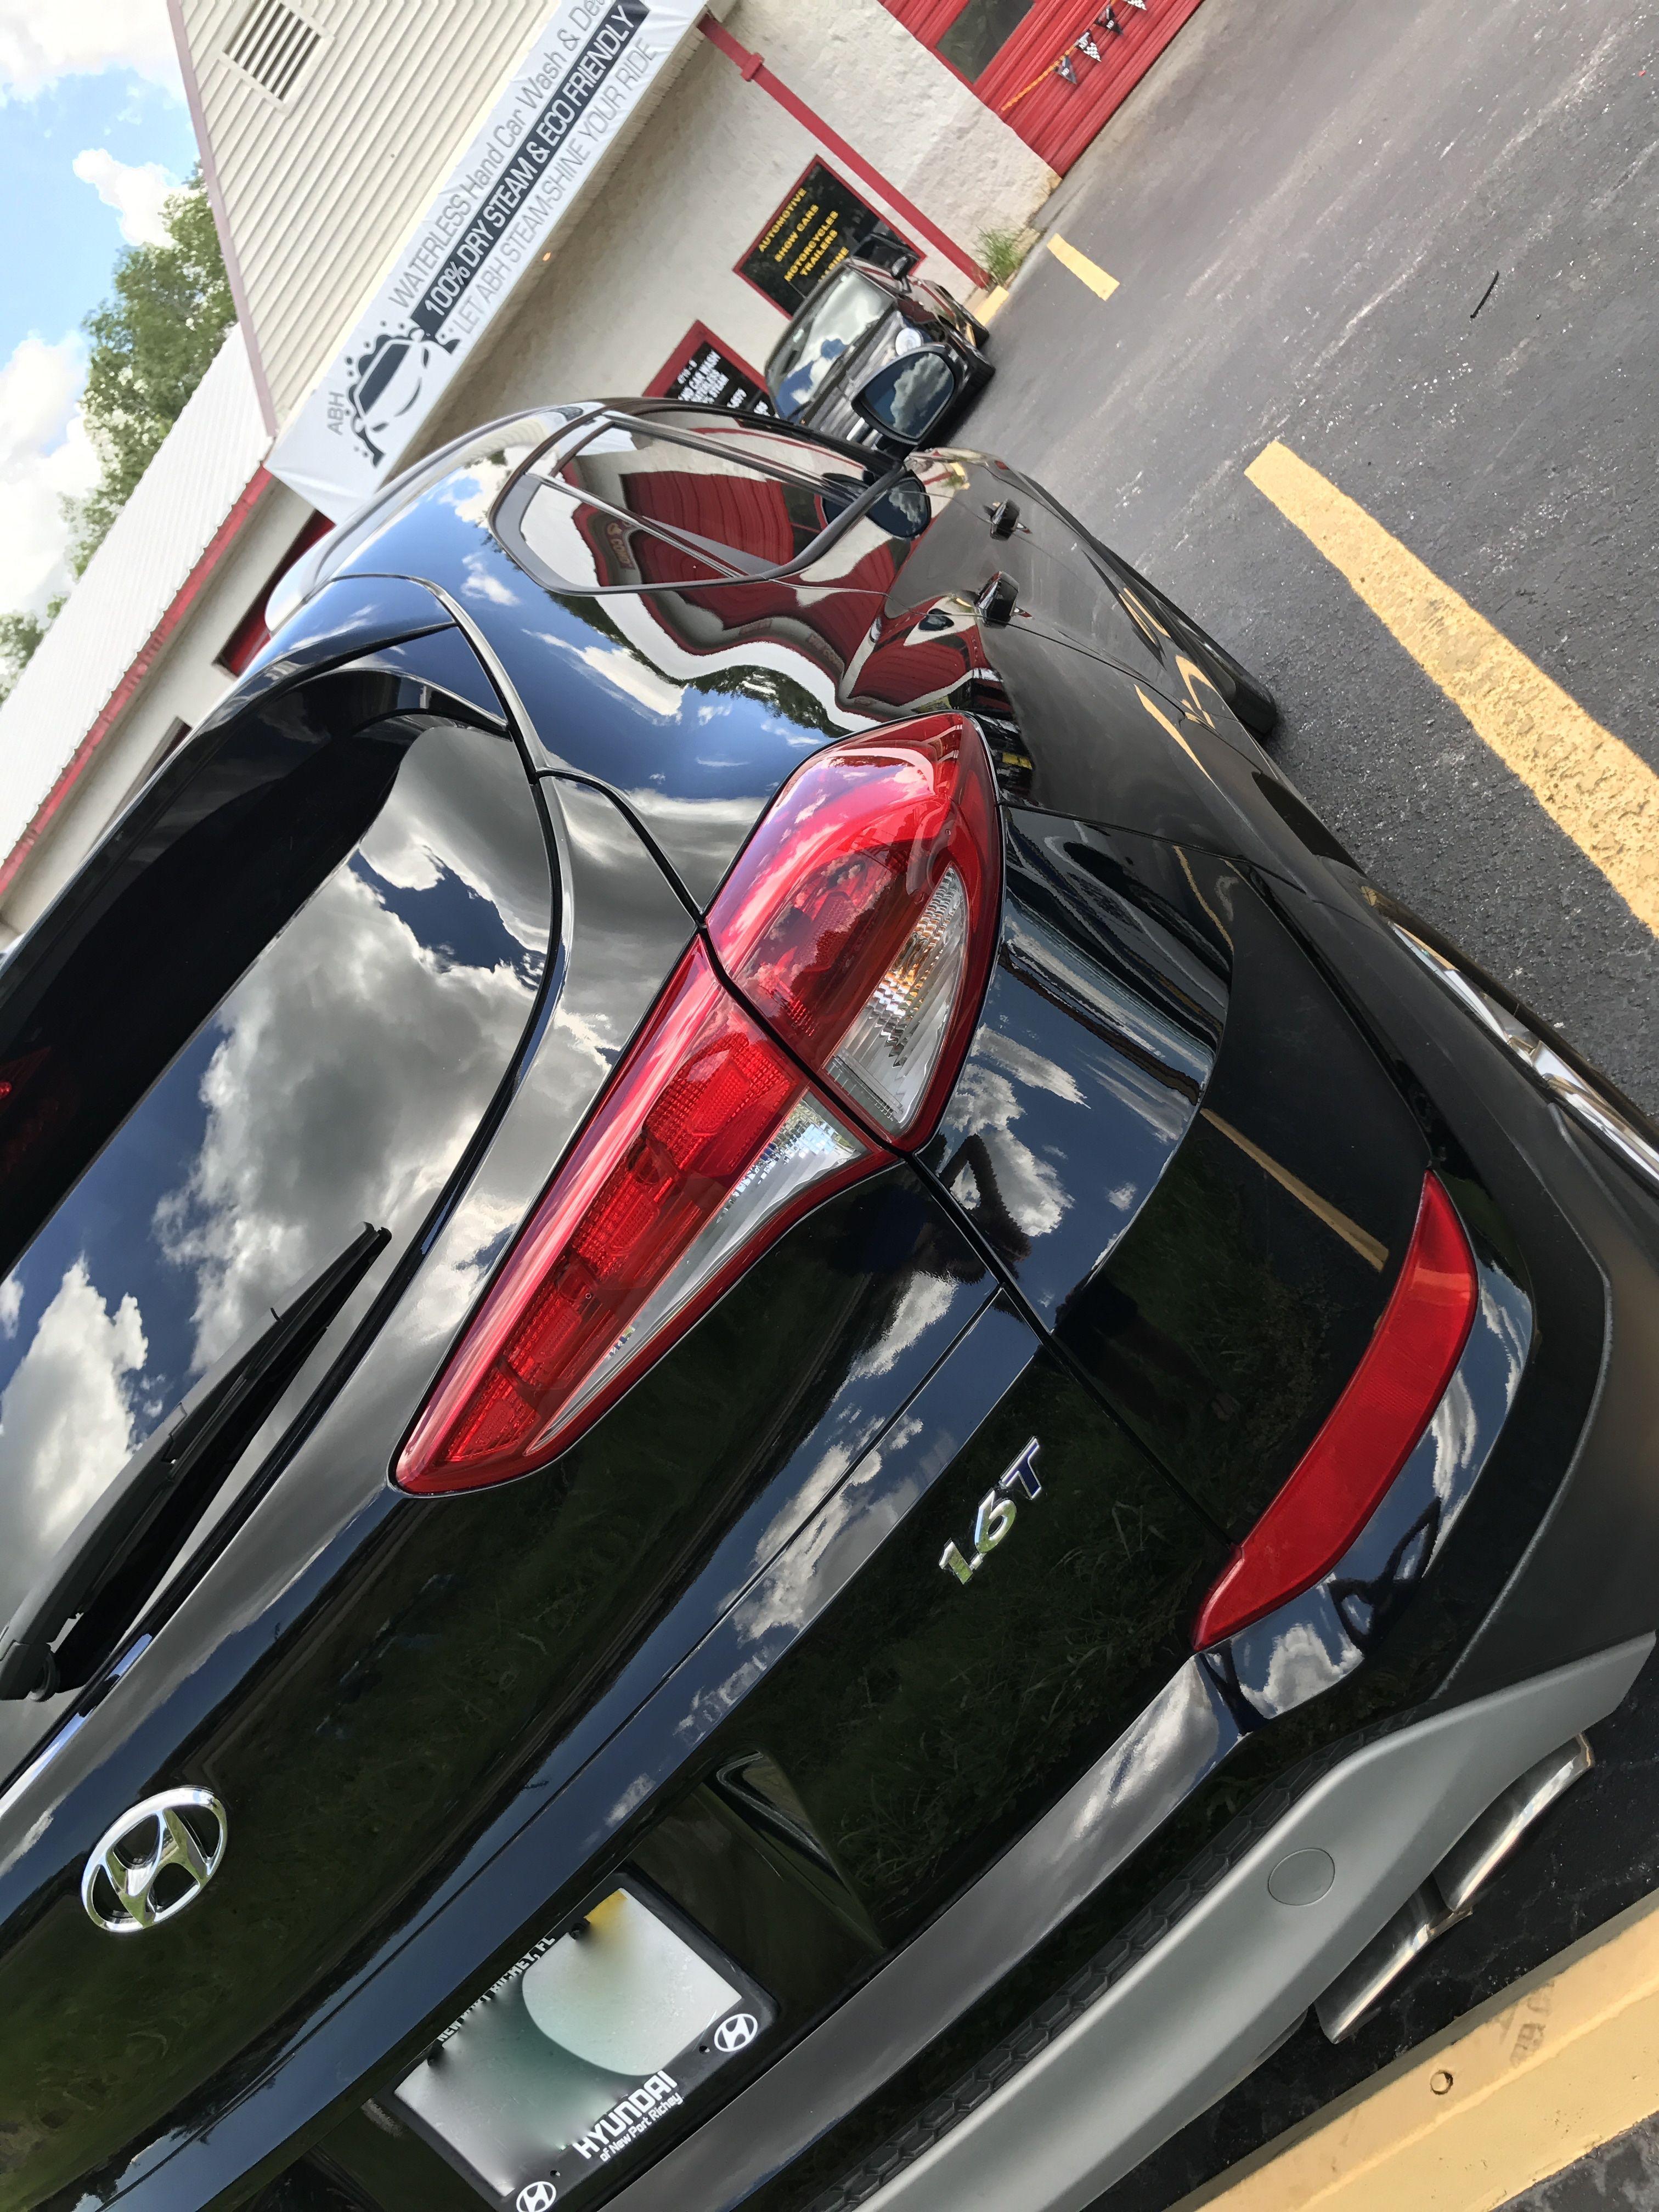 Full Service Steam Hand Car Wash on a Hyundai Tucson abhwaterless